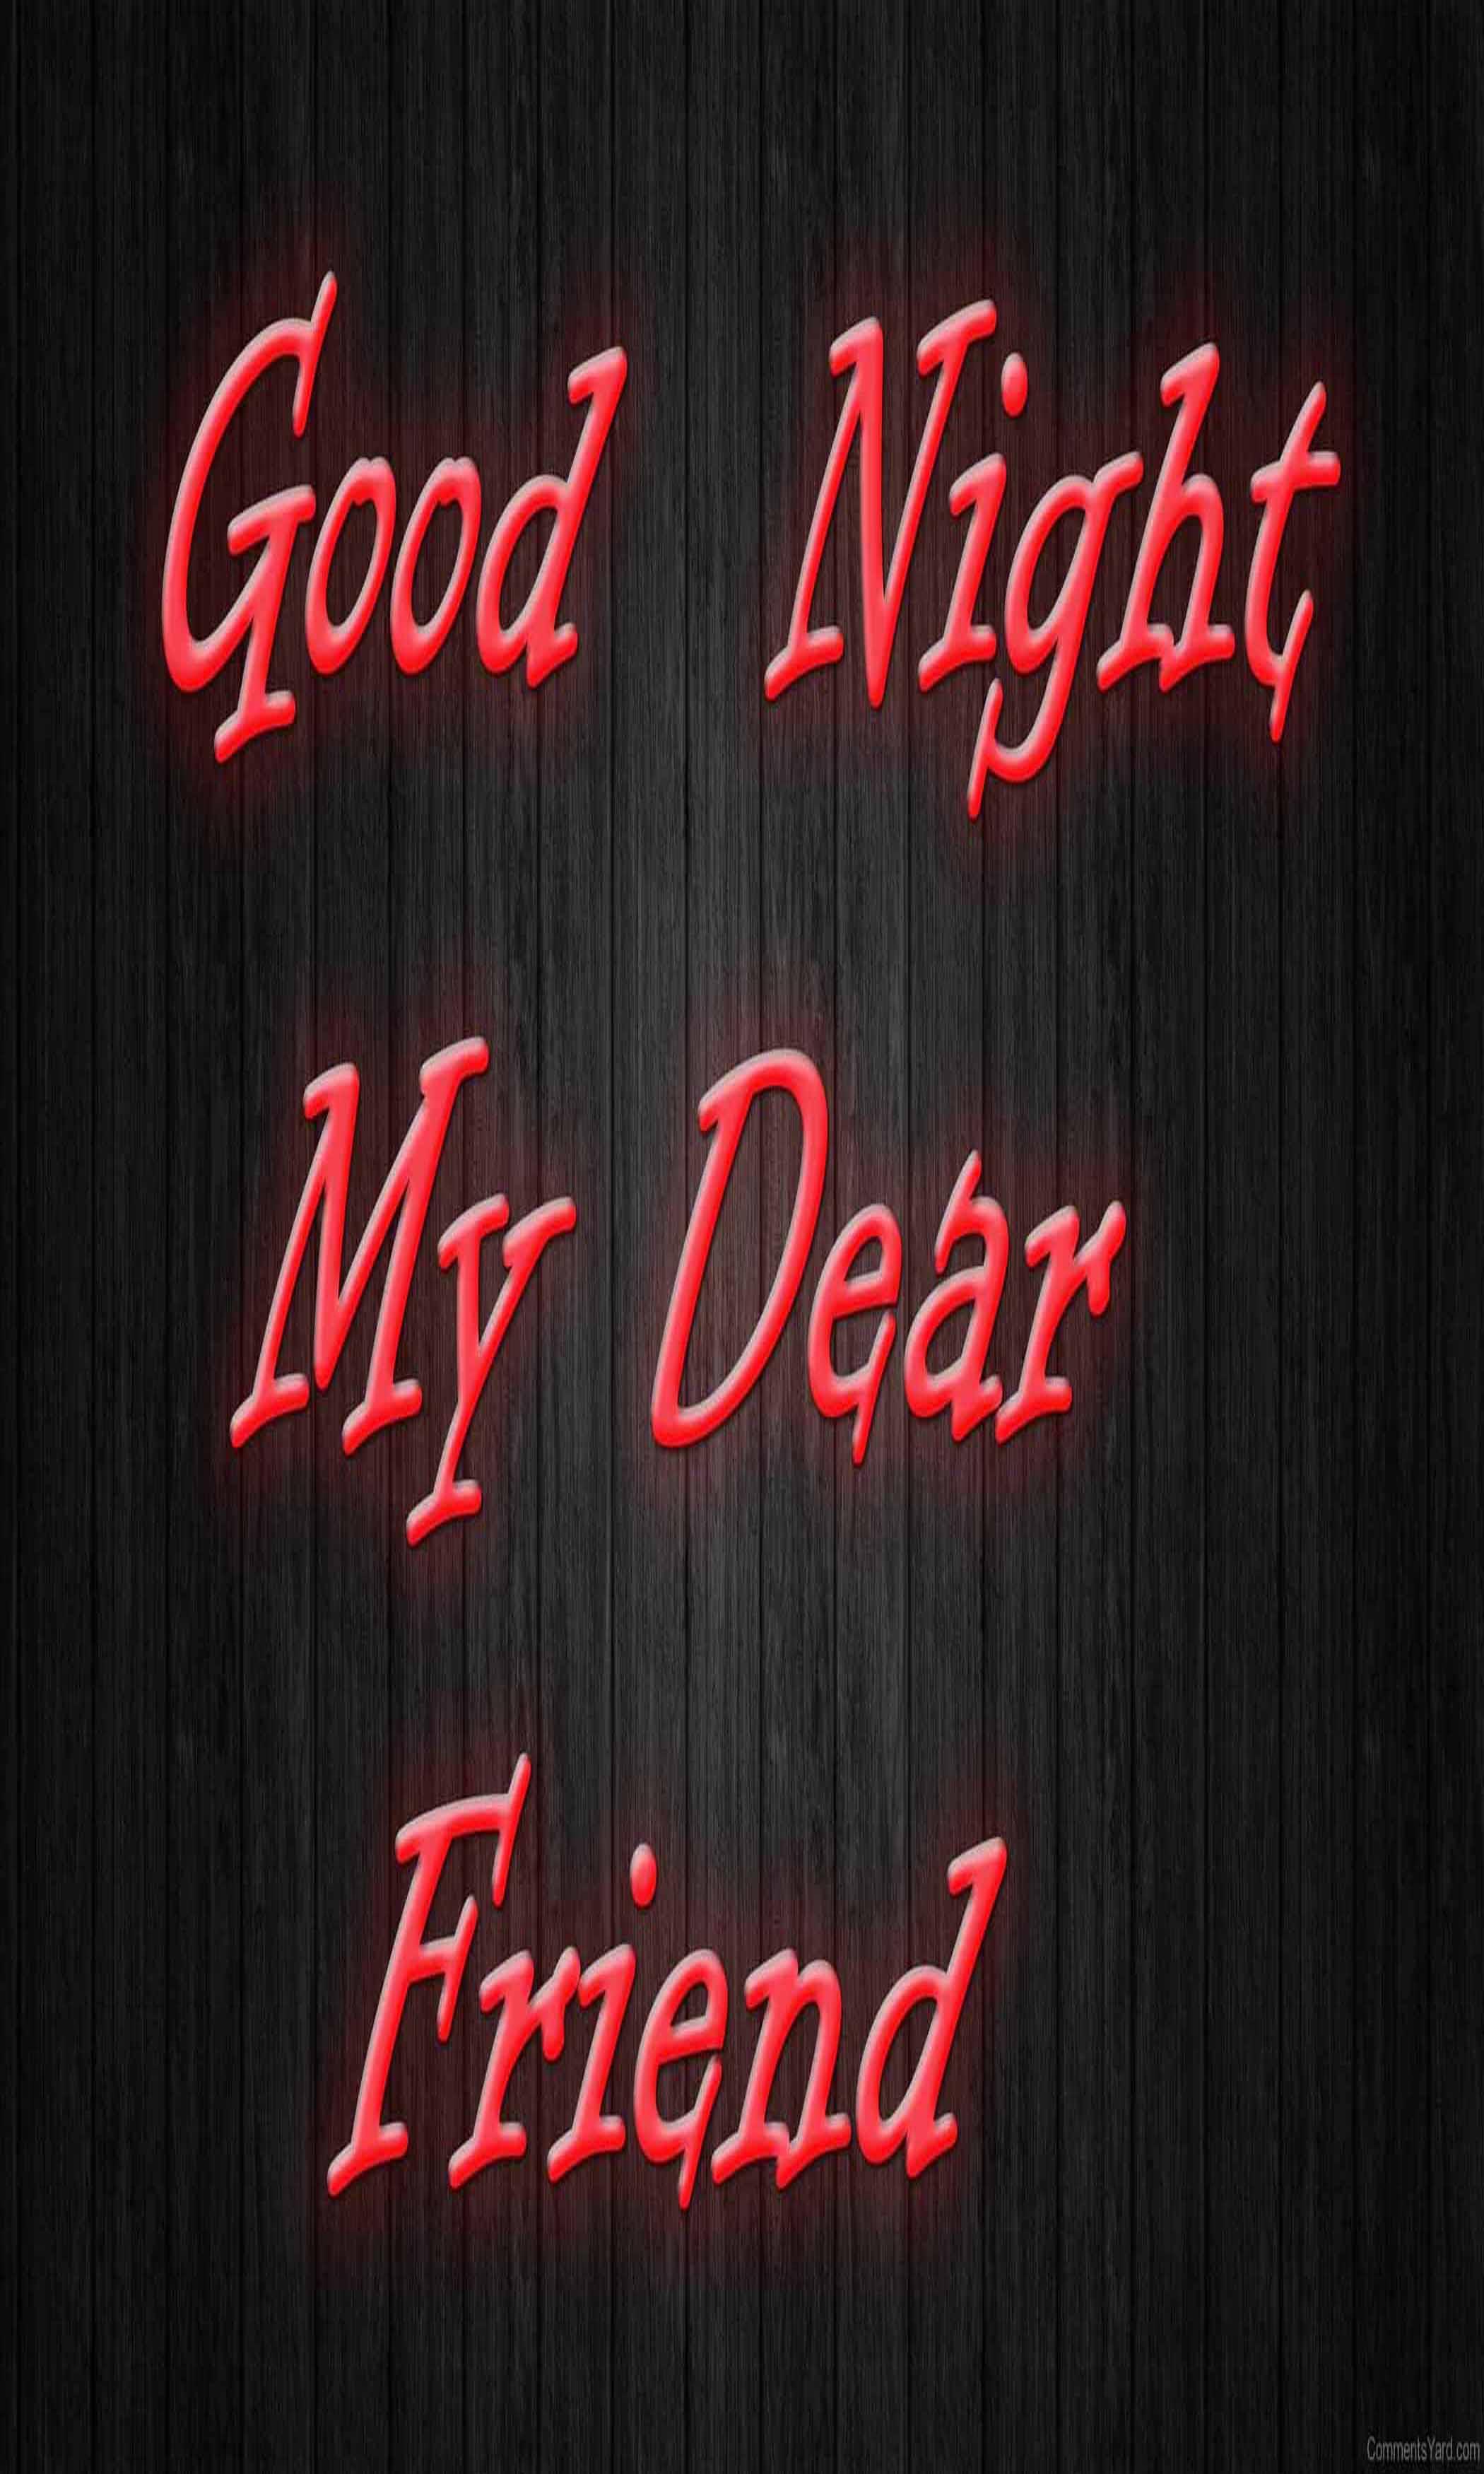 Good Night Friends Wallpapers HD - Wallpaper Cave